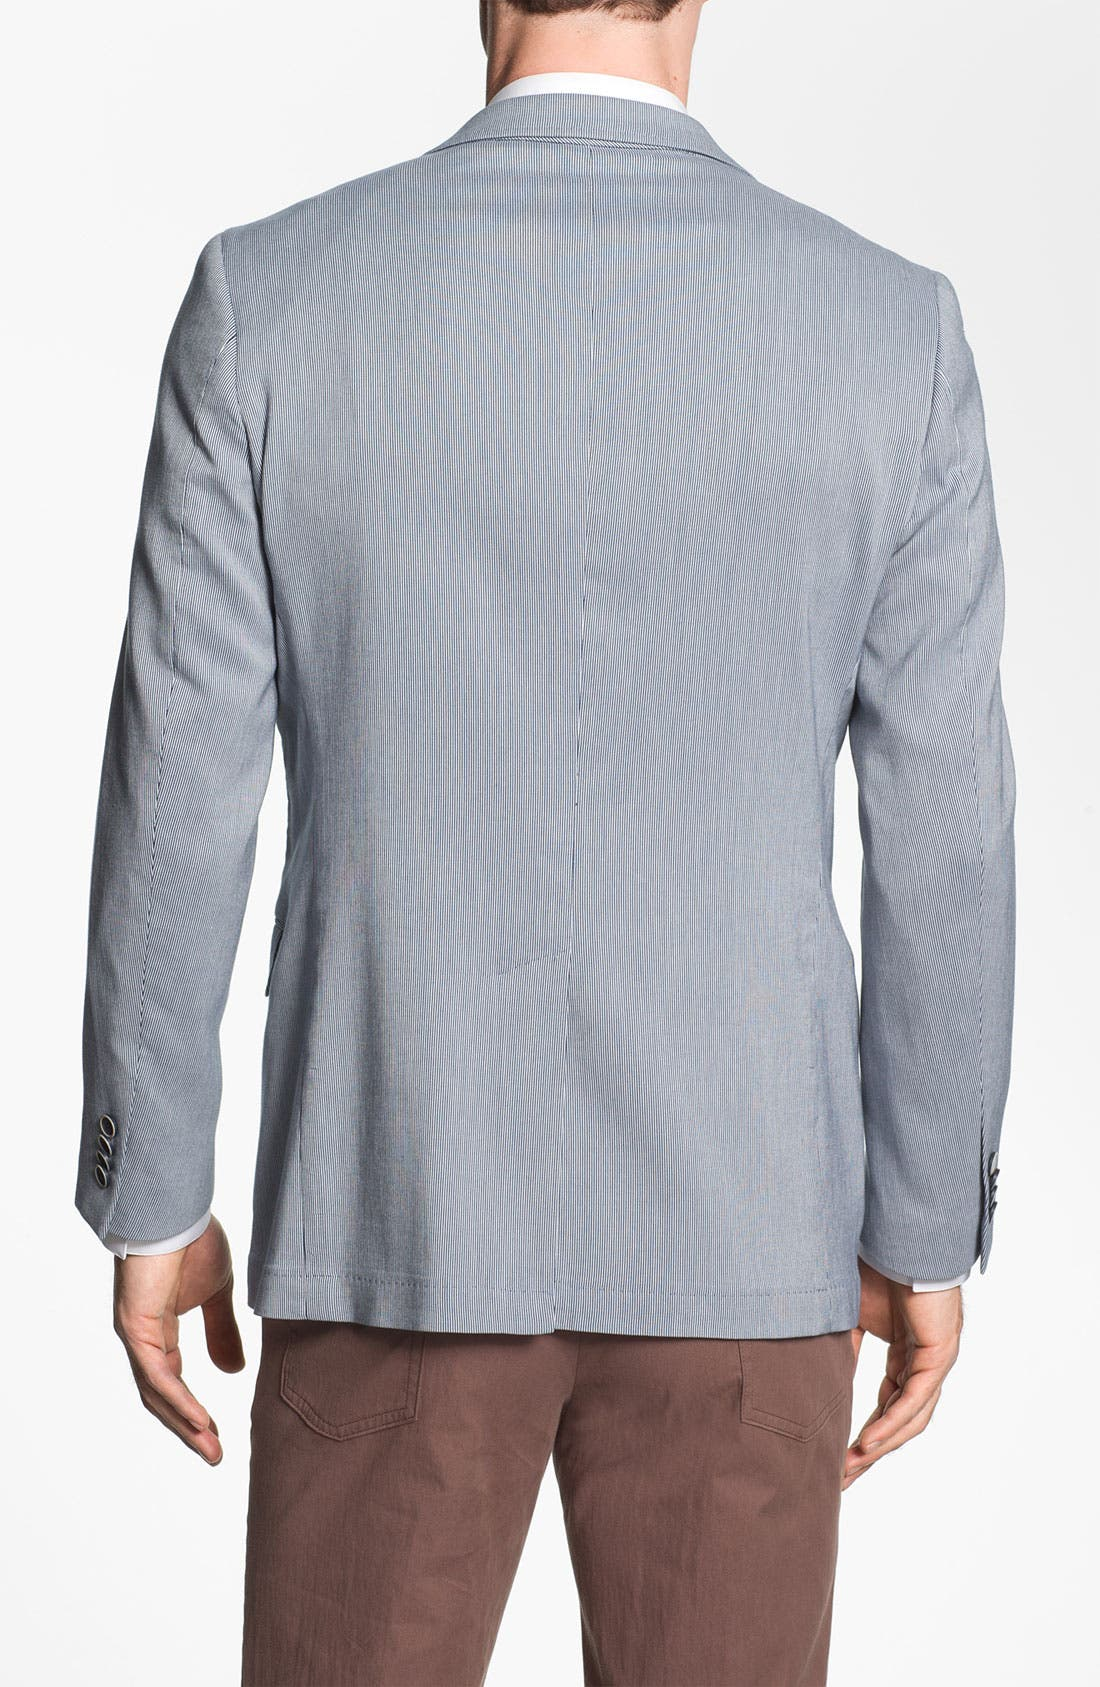 Alternate Image 2  - Michael Kors Trim Fit Cotton Blend Sportcoat